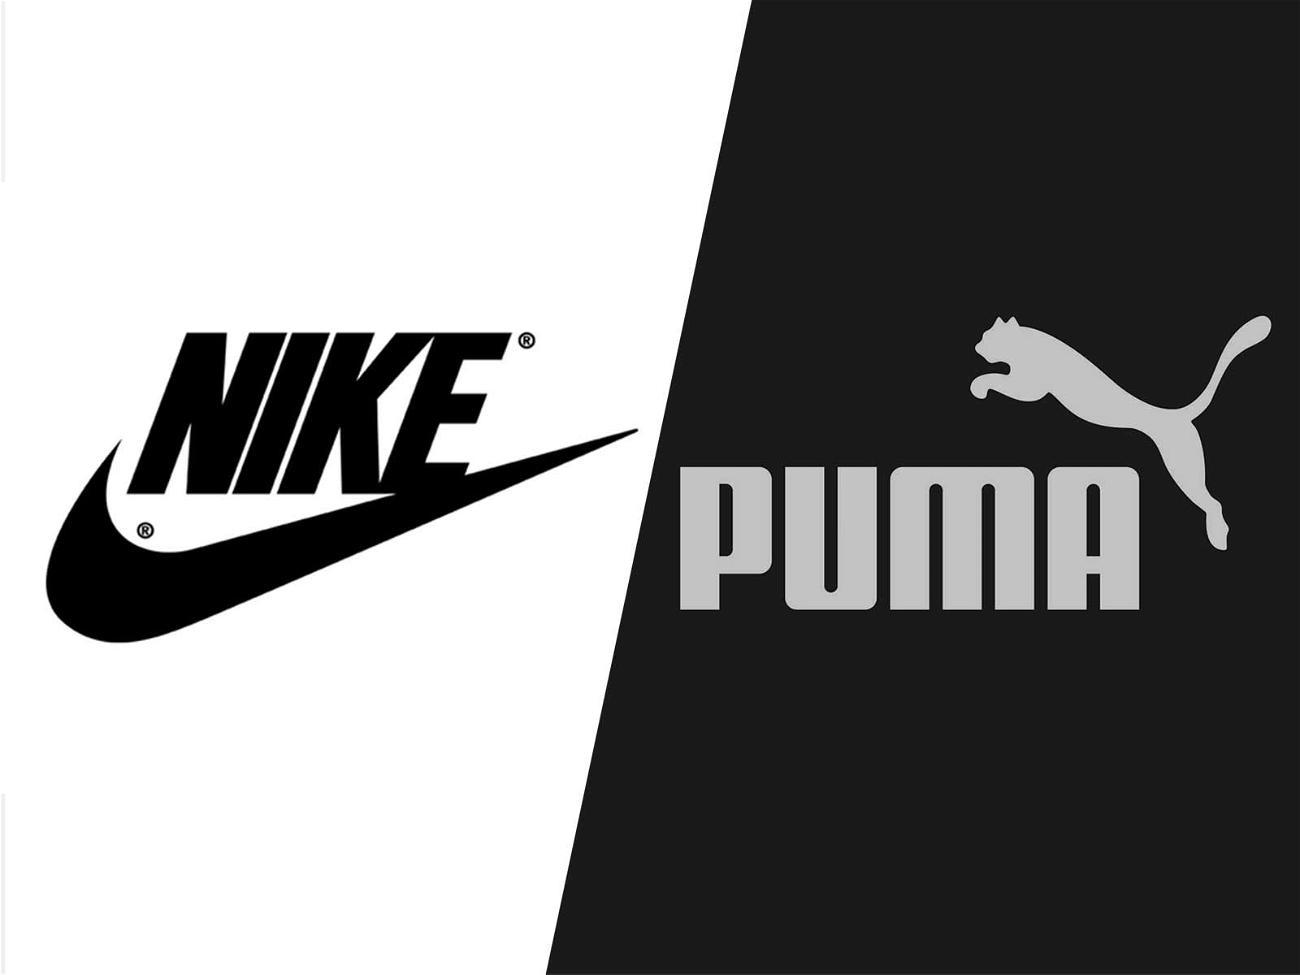 Nike Accuses Puma of Being a Footwear Copycat, Files Suit - The Blast